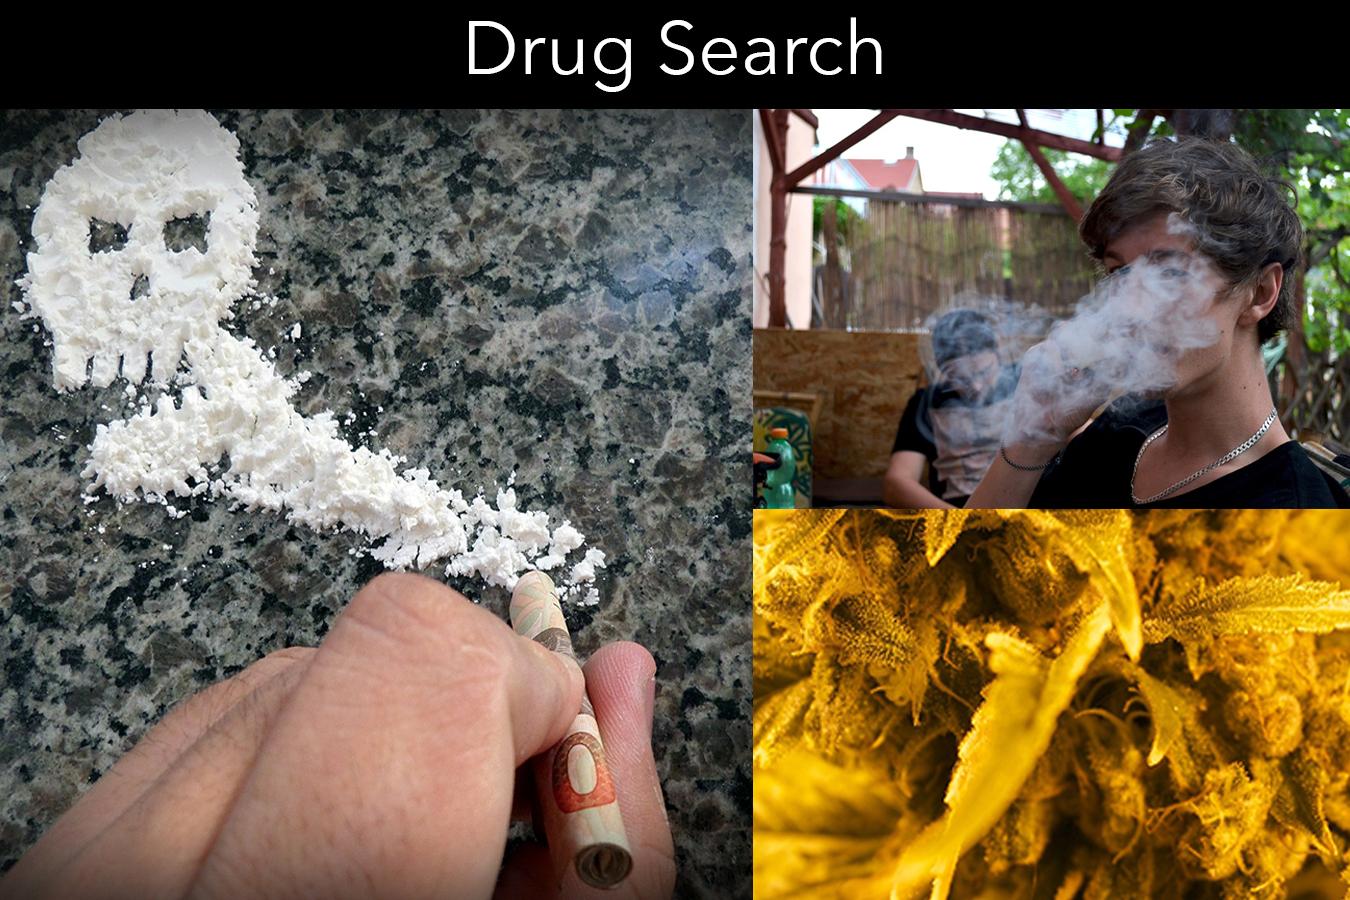 K-9 Drug Search